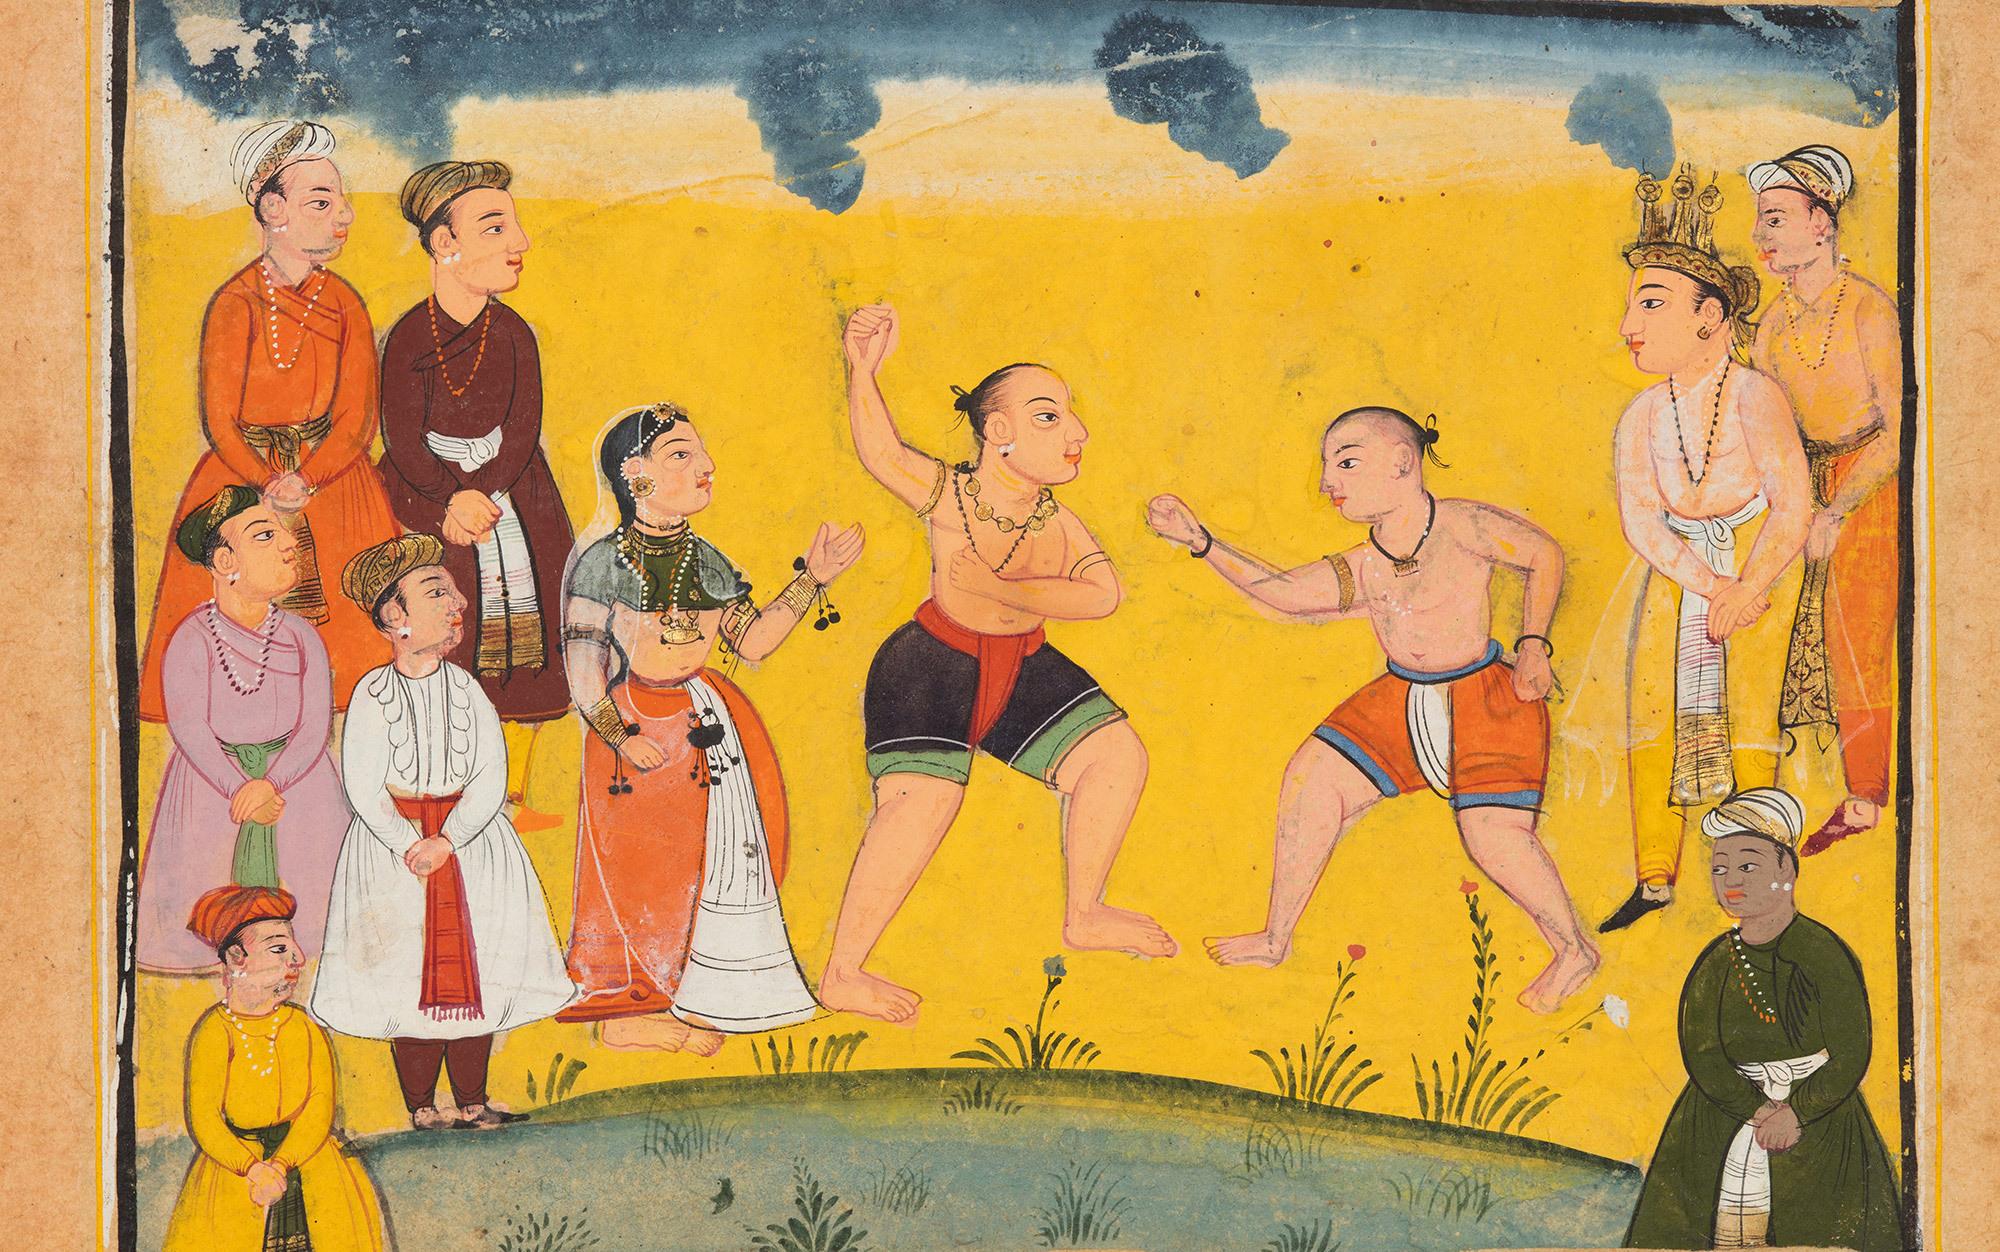 The living Mahabharata | Aeon